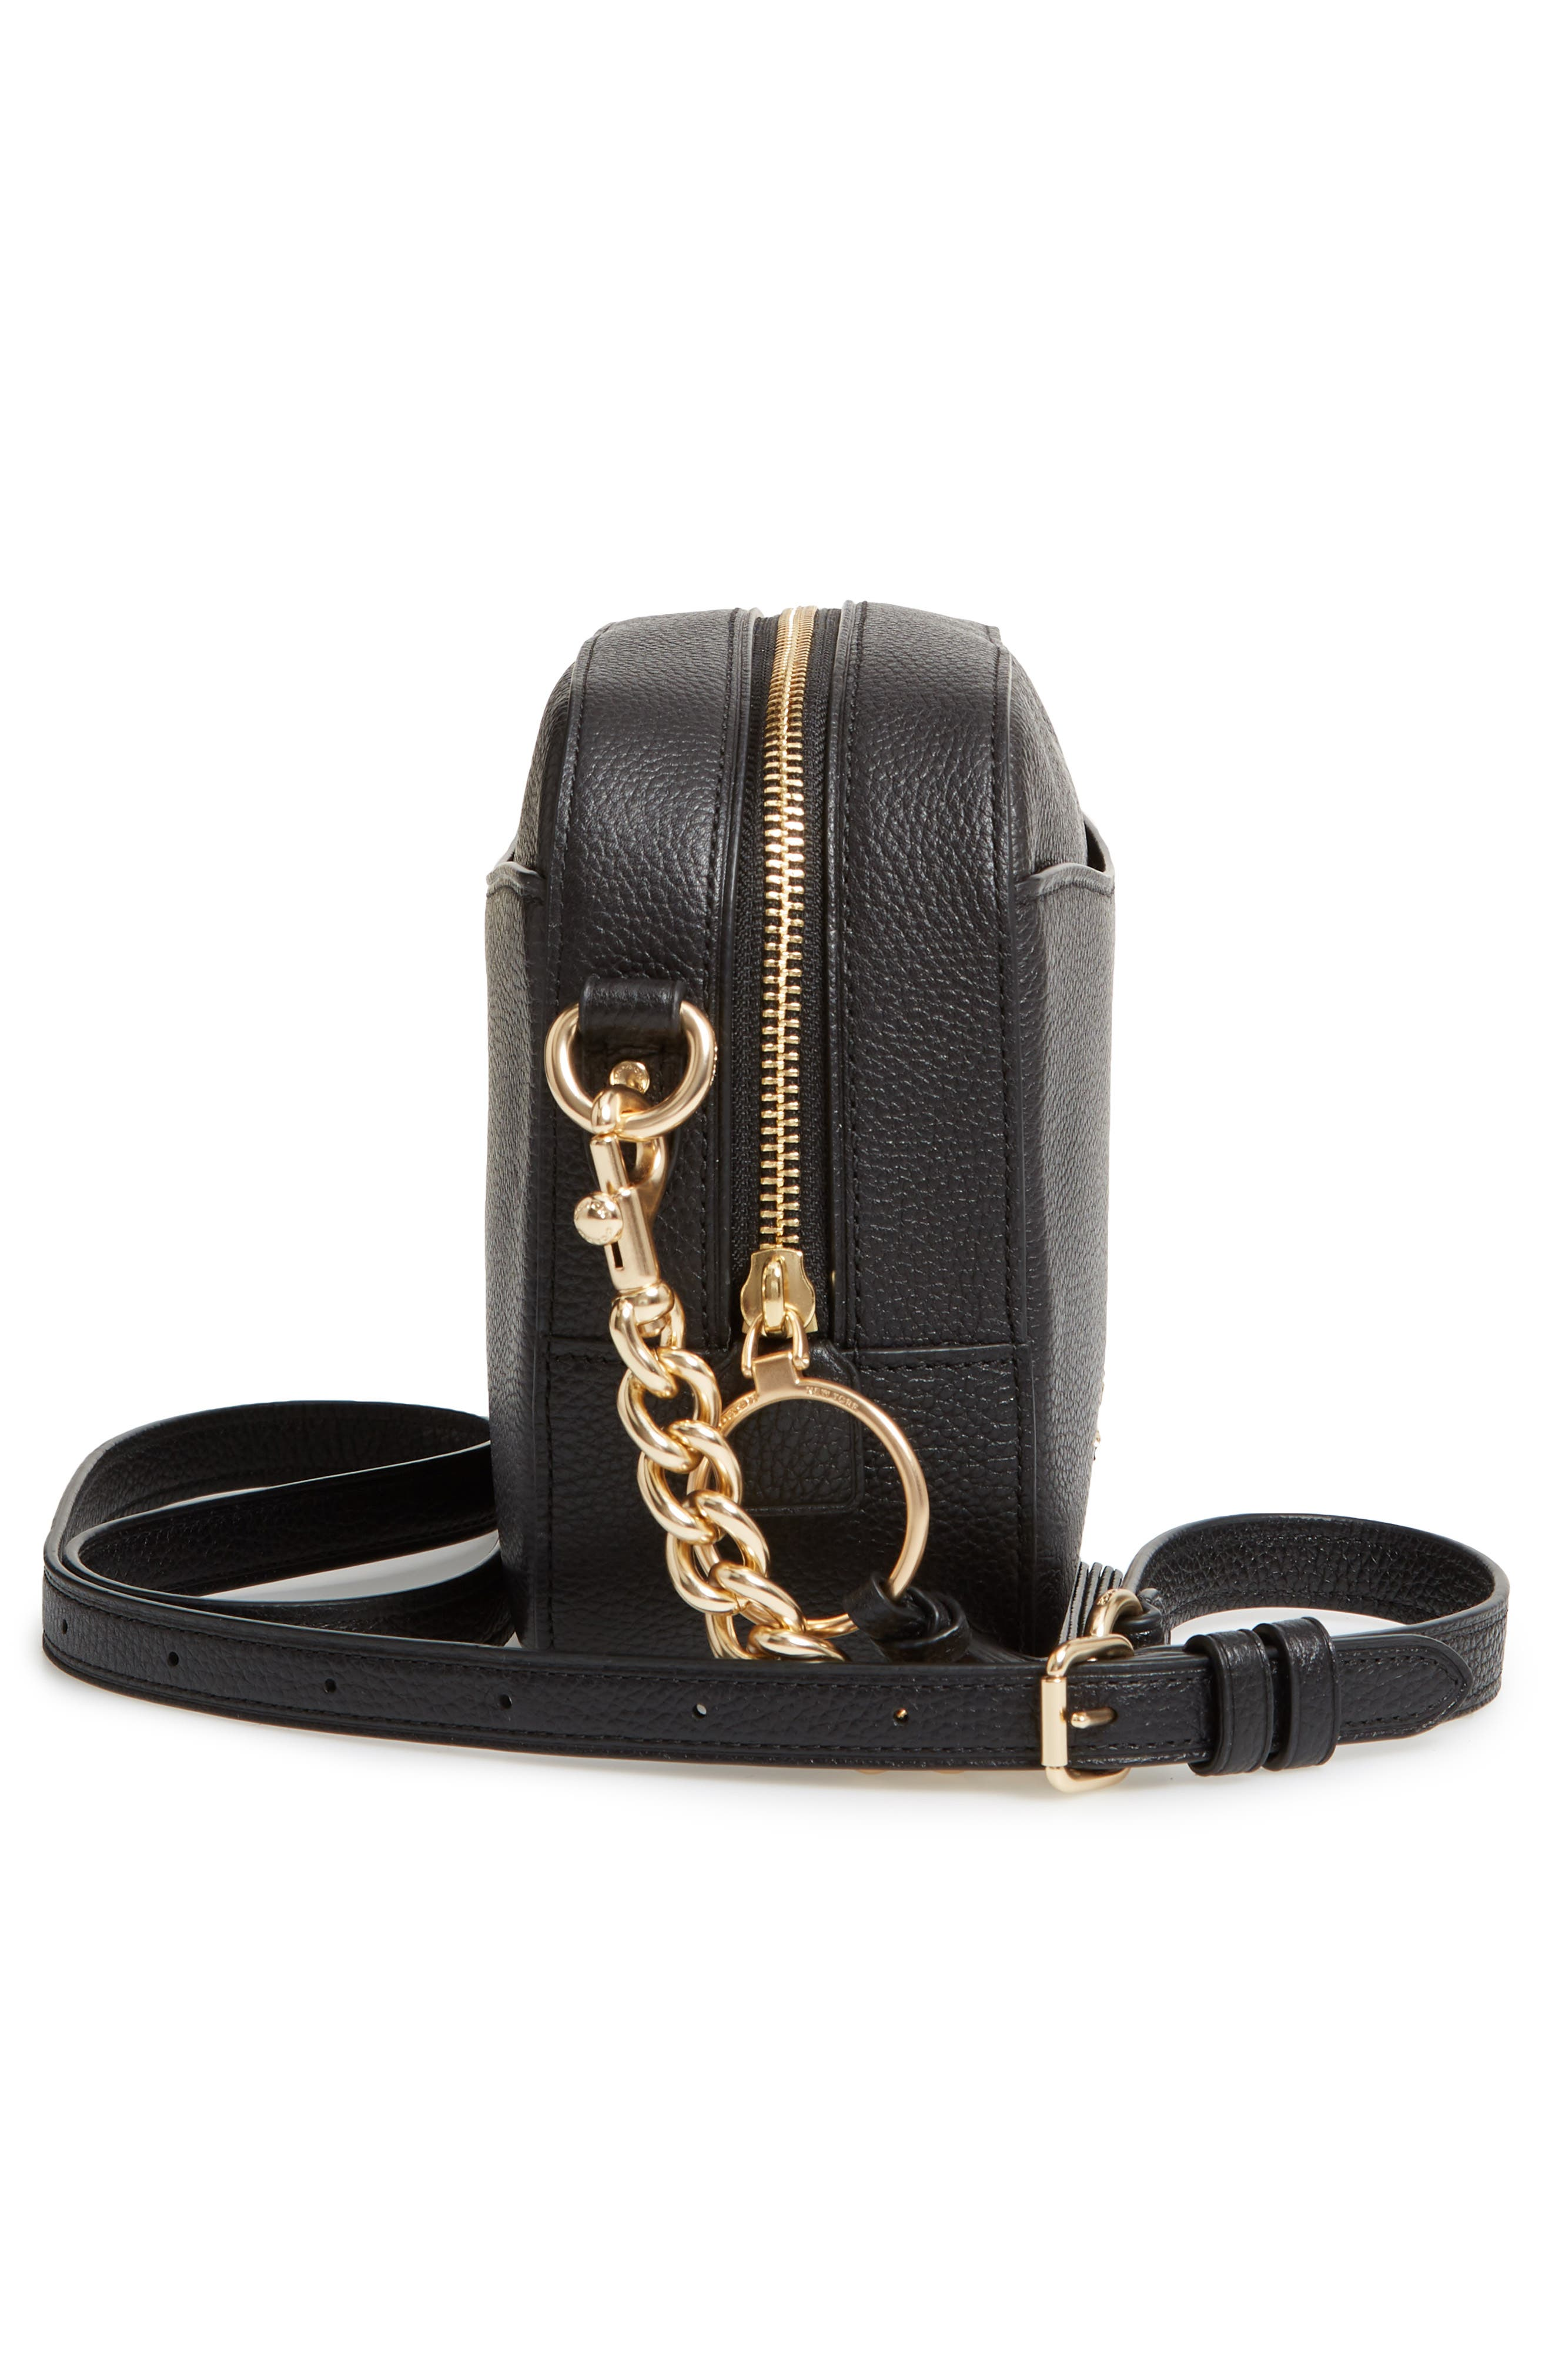 COACH, Pebbled Leather Camera Bag, Alternate thumbnail 6, color, BLACK